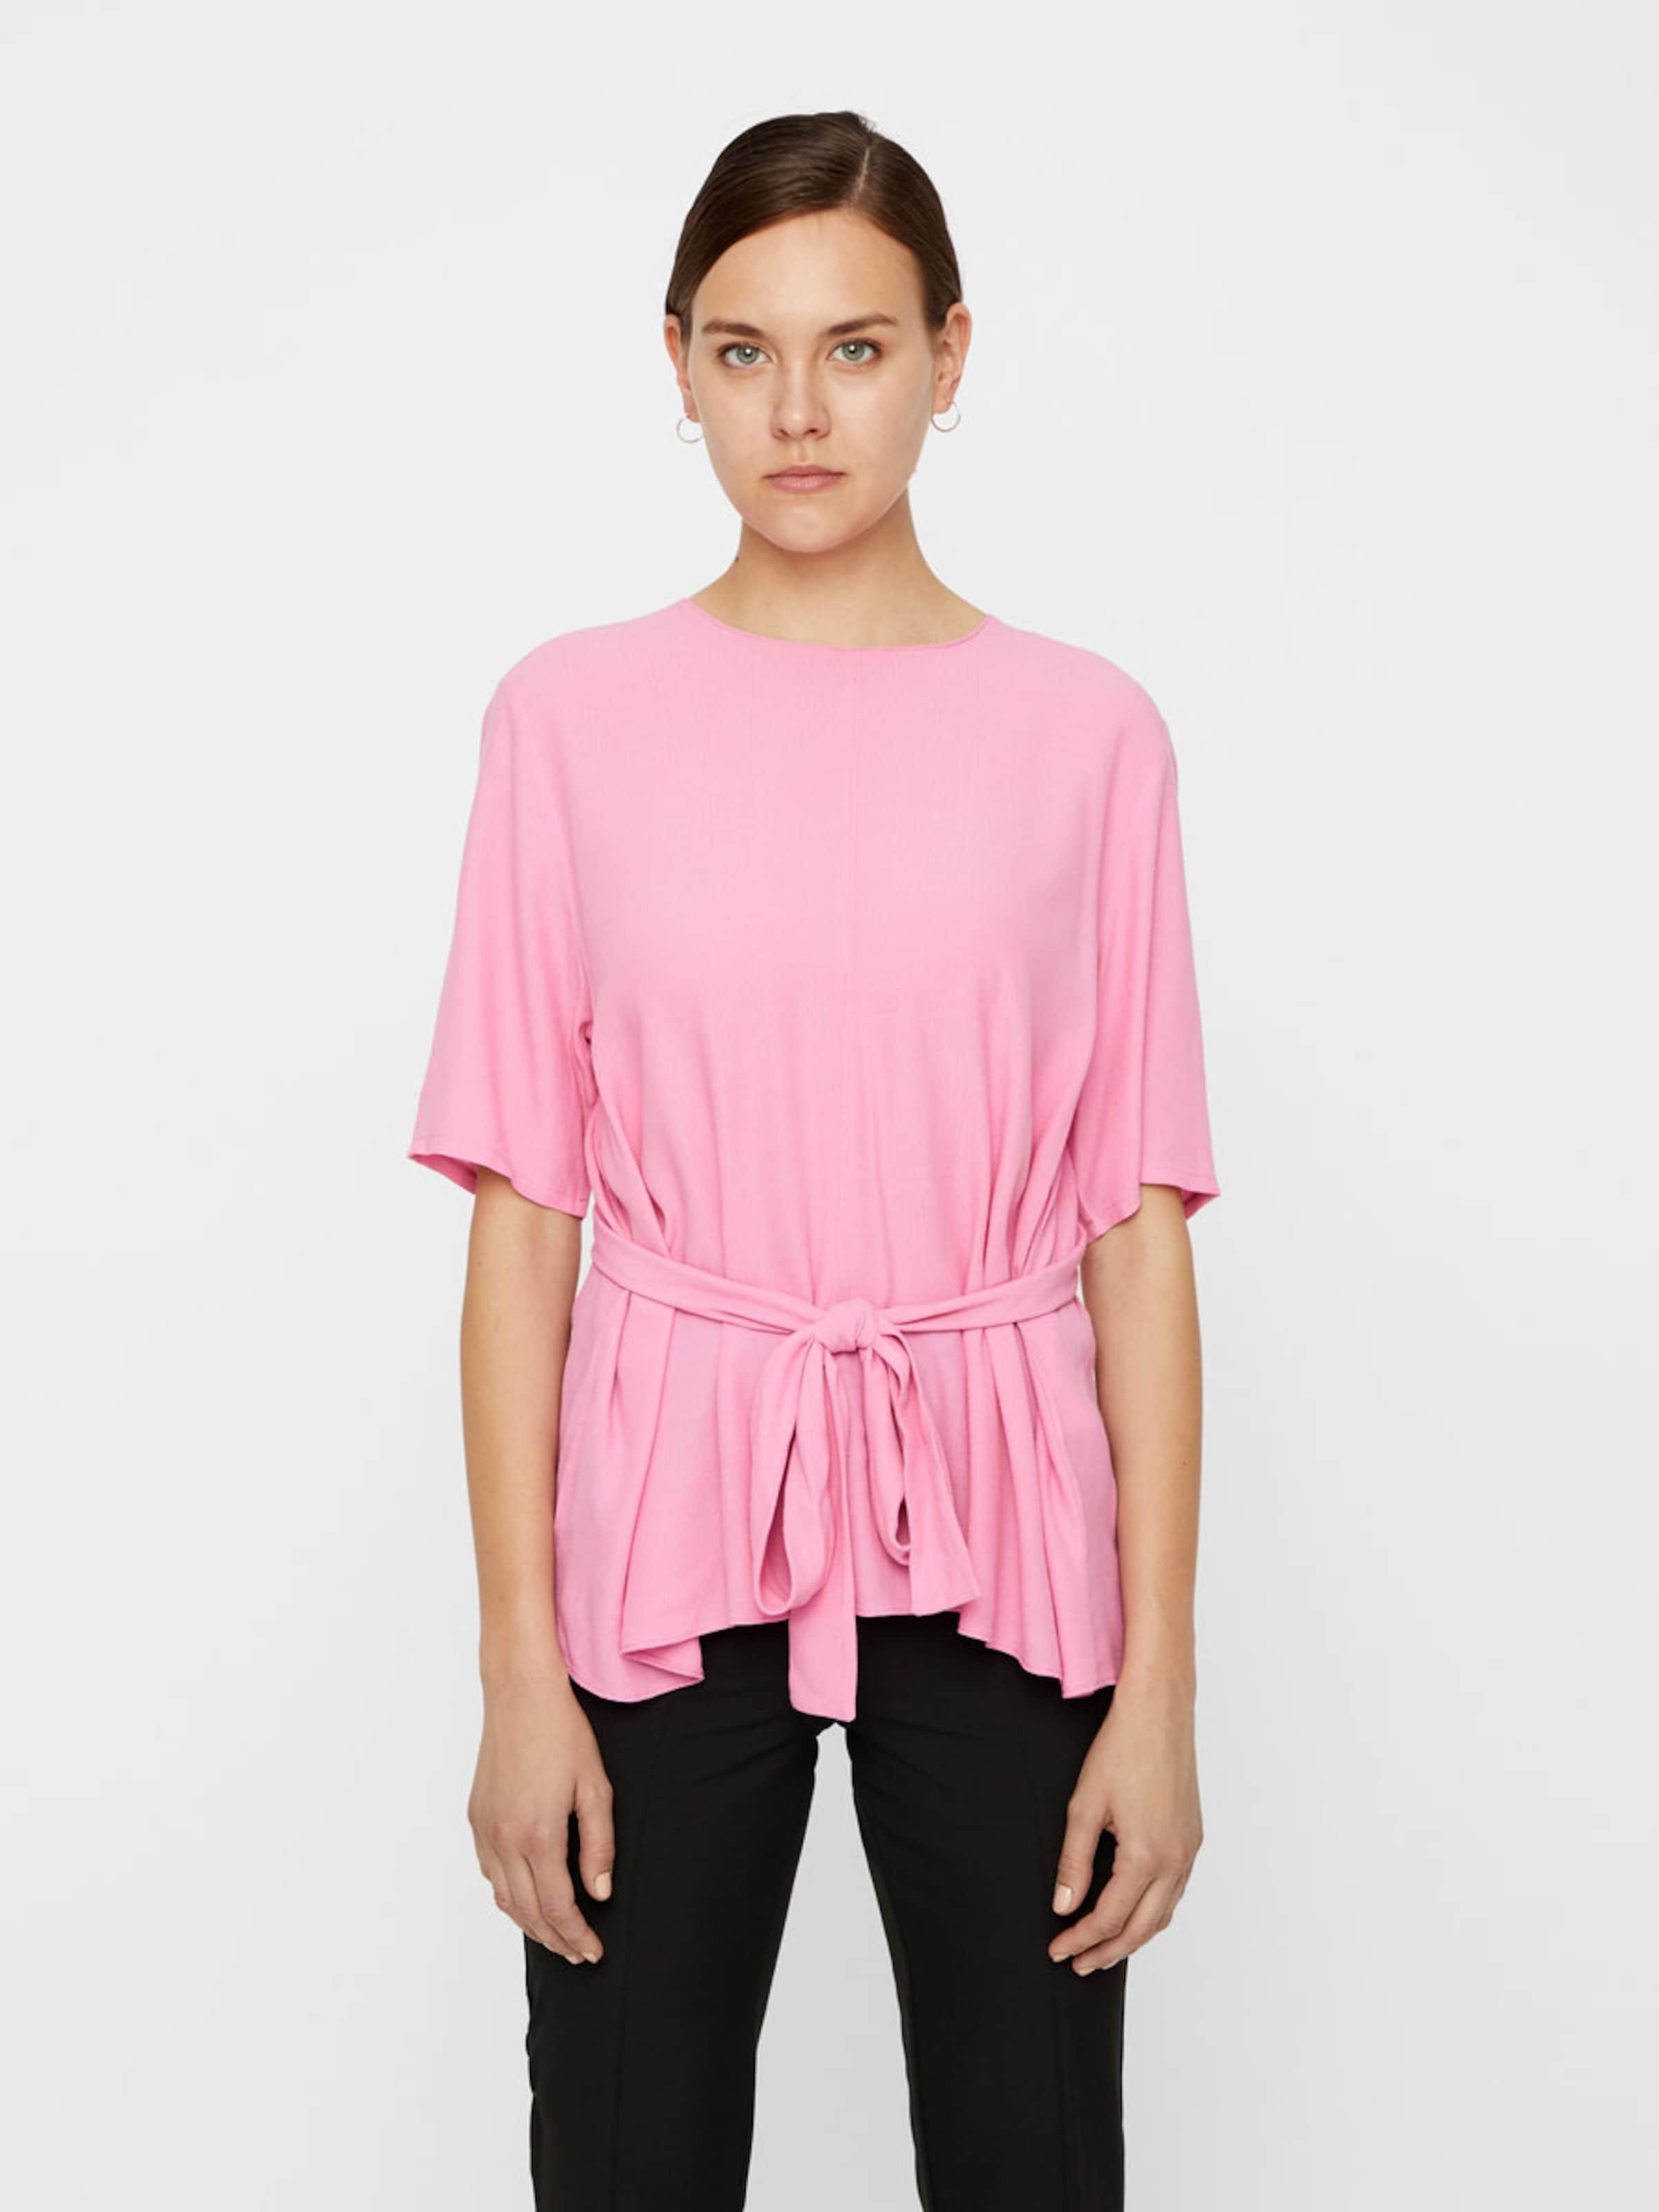 Y Rose T s En shirt a rBWxoedC